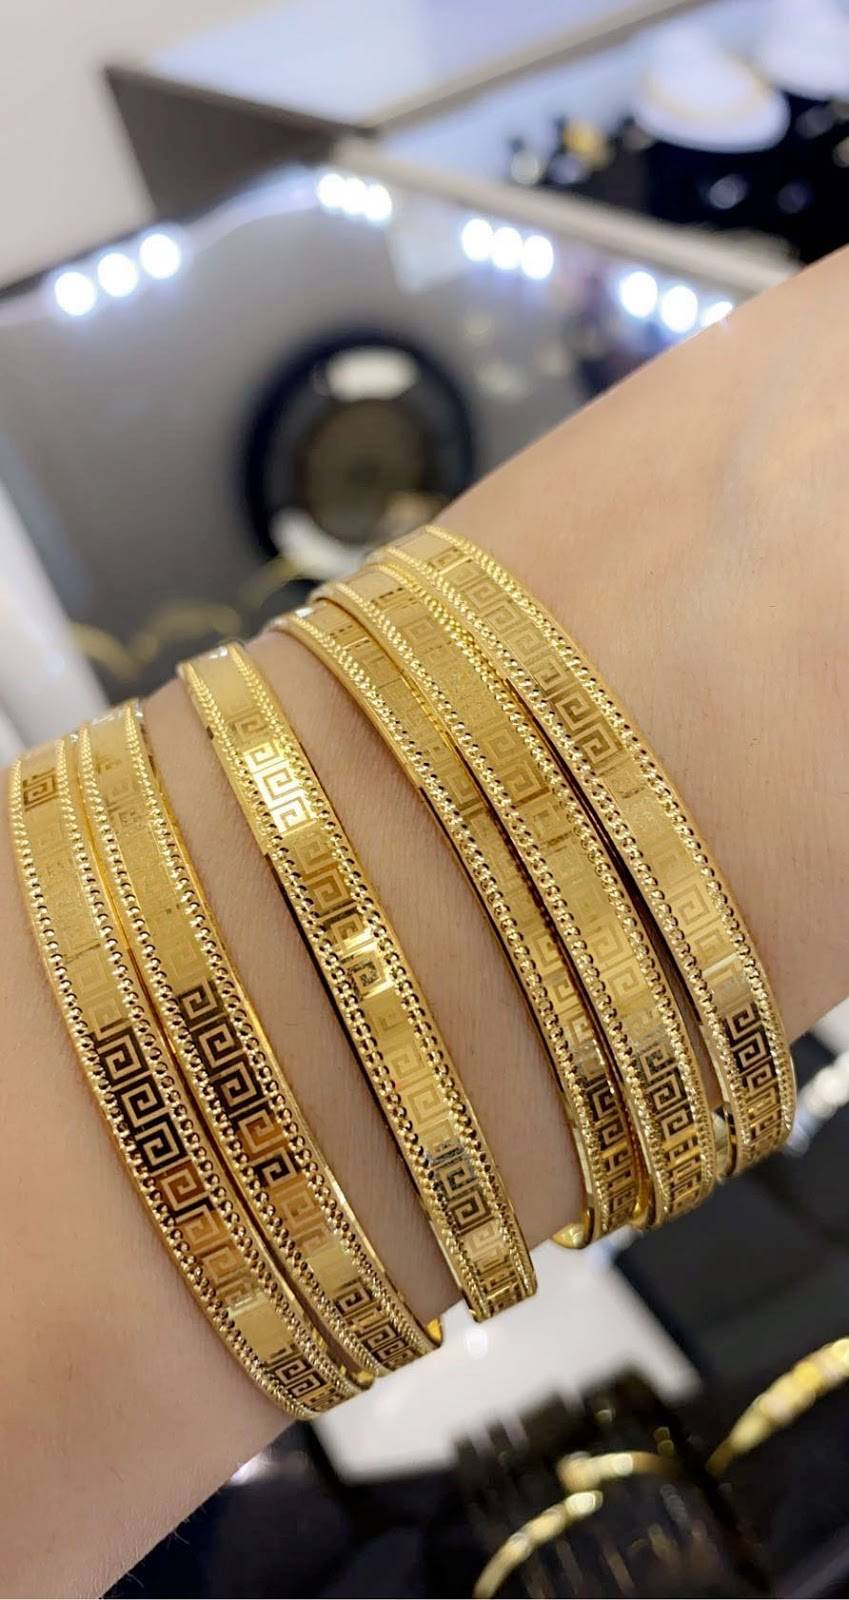 Queen jewelry - jewelry store  | Photo 8 of 10 | Address: 4064 E 14 Mile Rd, Warren, MI 48092, USA | Phone: (586) 303-2991